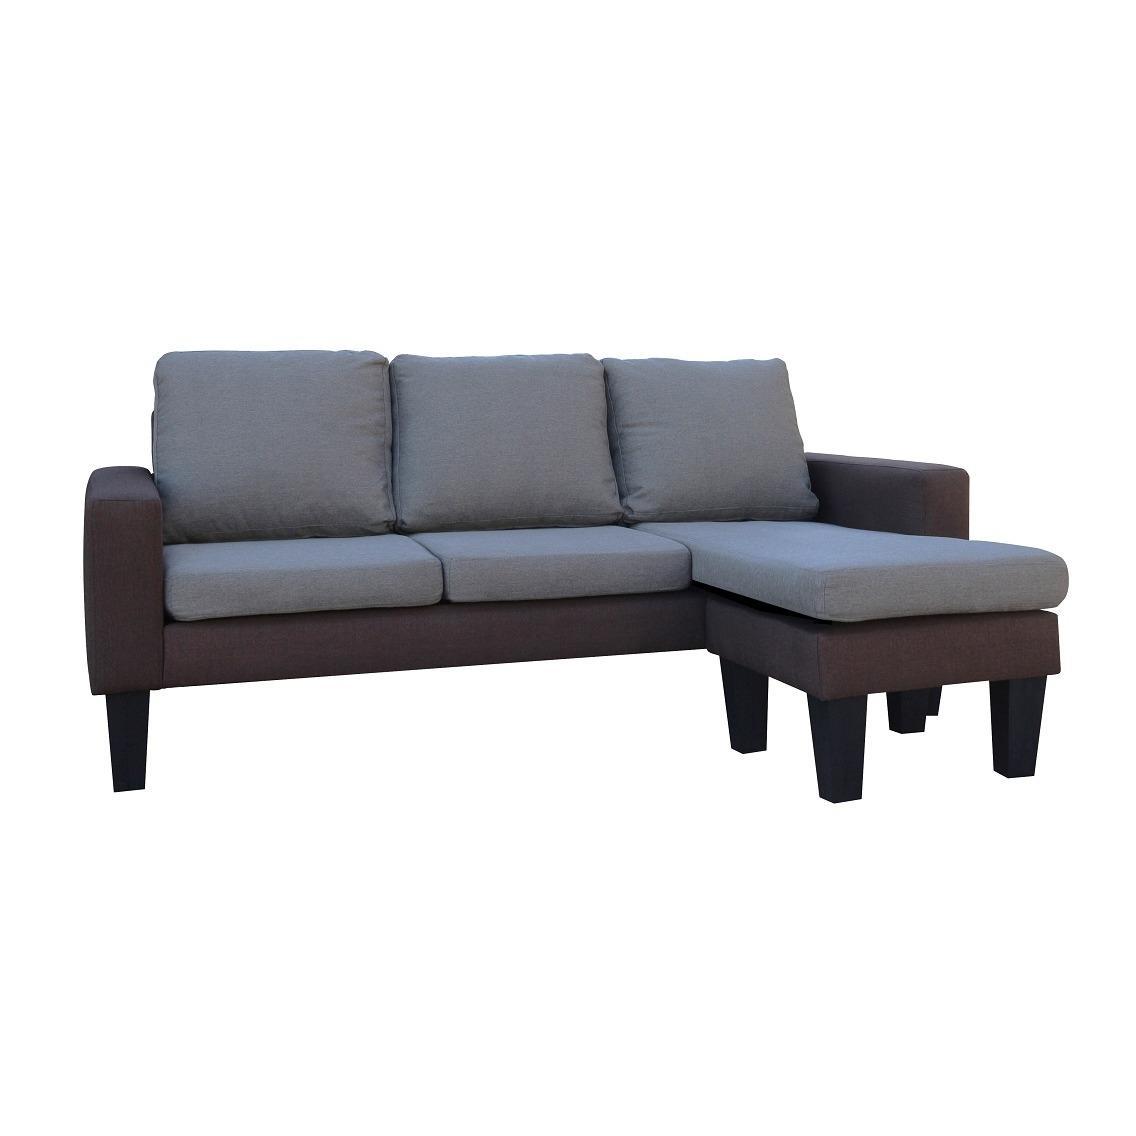 Ihome Genesis L Shape Sofa Set